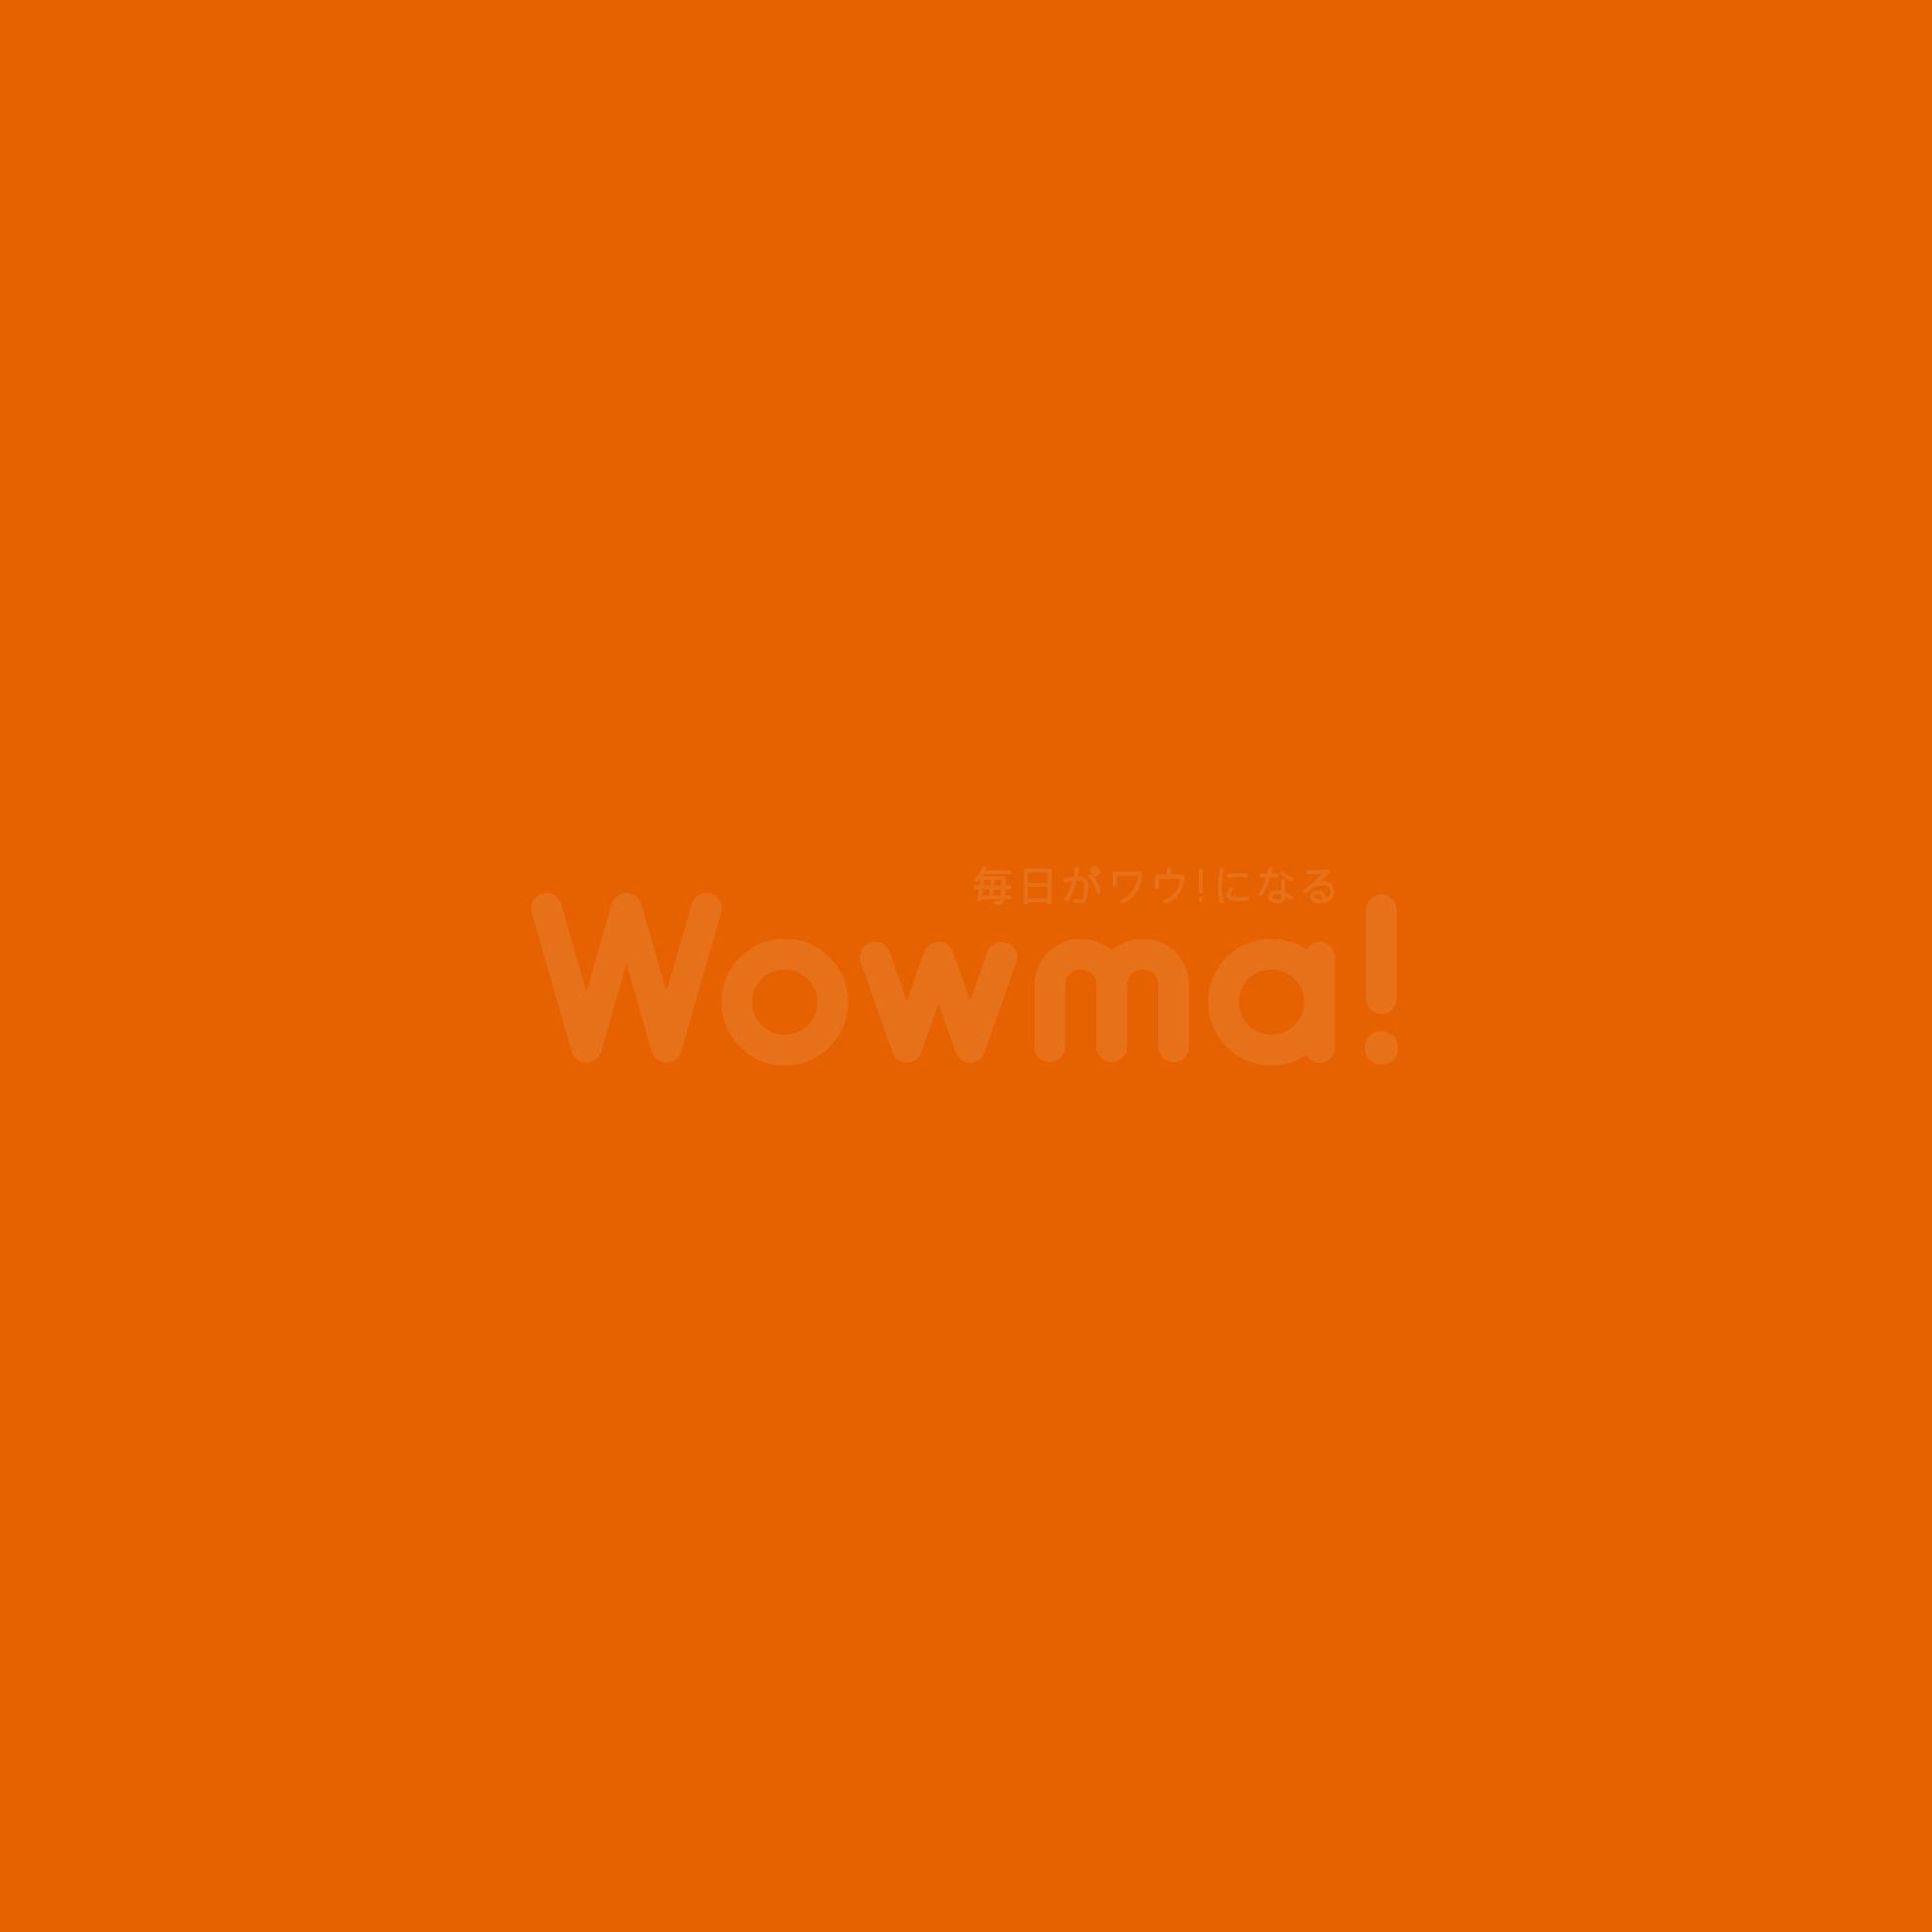 Wowma店が新OPEN!